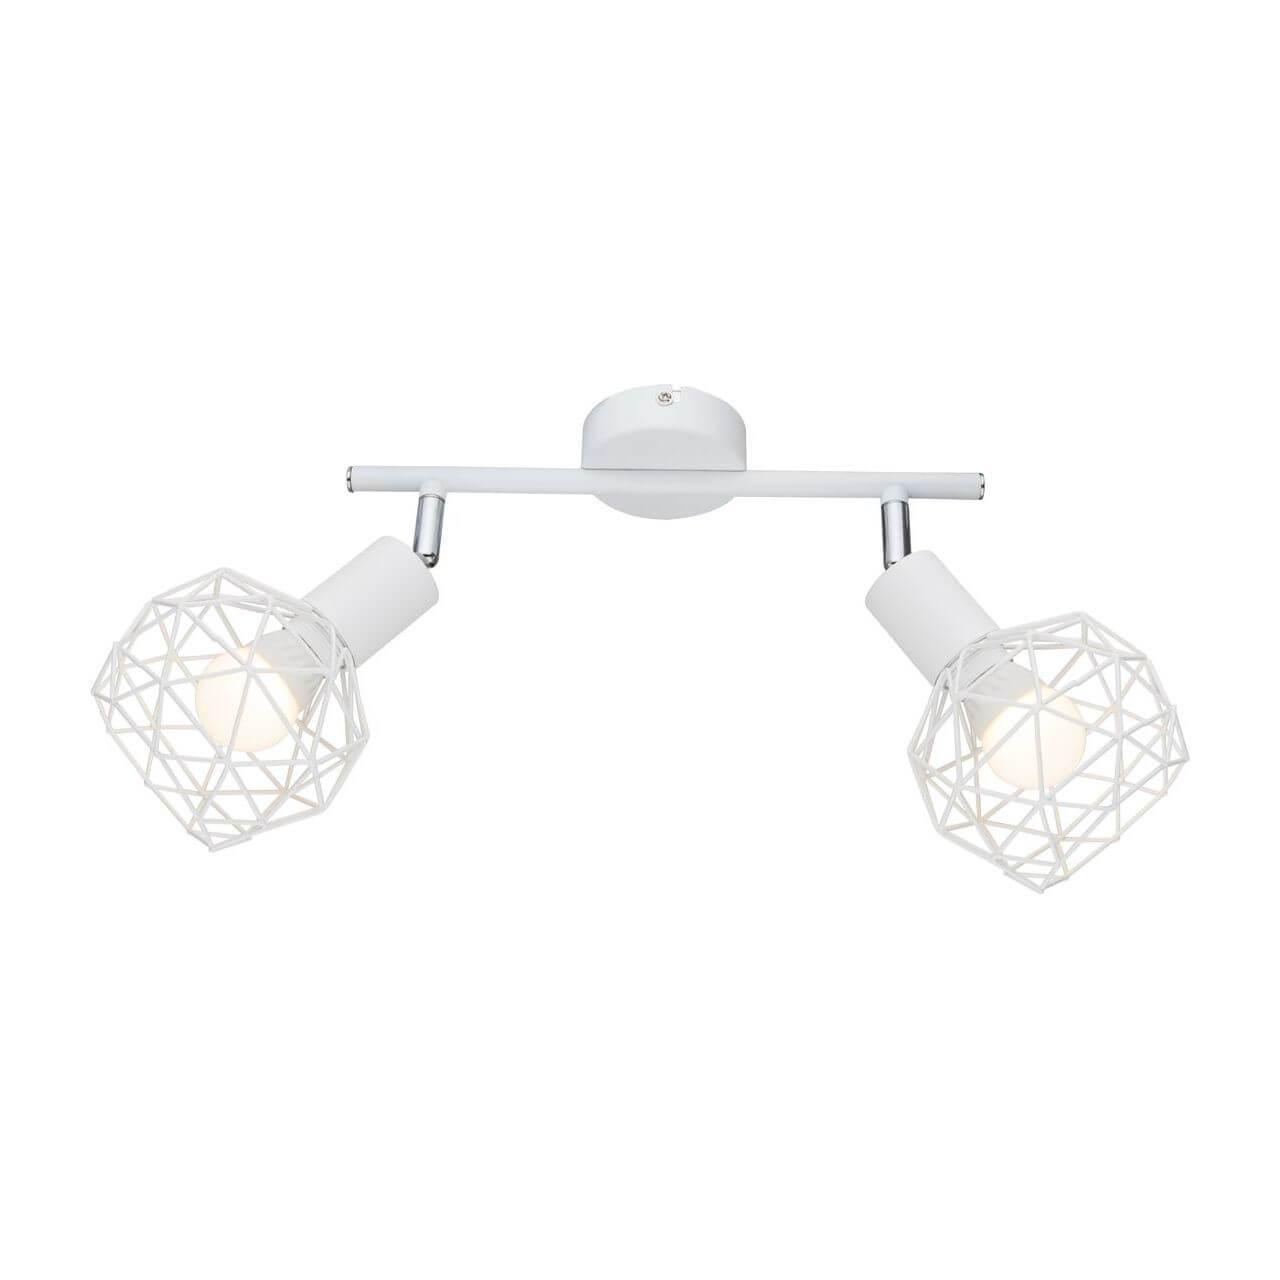 Спот Arte Lamp A6141AP-2WH, E14, 40 Вт arte lamp спот arte lamp 86 a9128ap 2wh